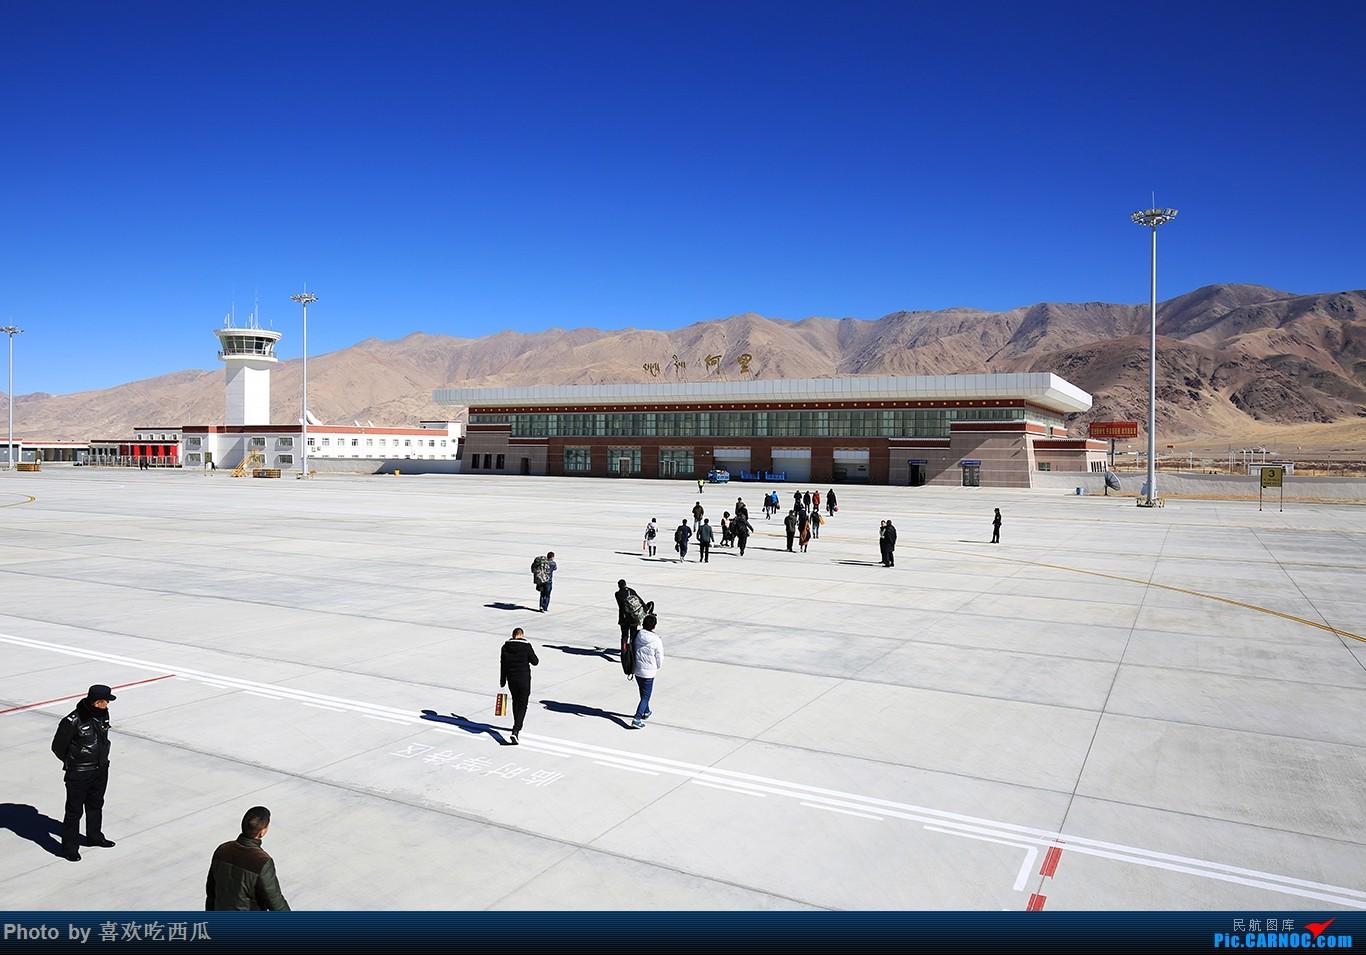 Re:[原创]西瓜游记55,由一张X舱引发的一大堆X舱游记,阿里昆莎的24个小时    中国阿里昆莎机场